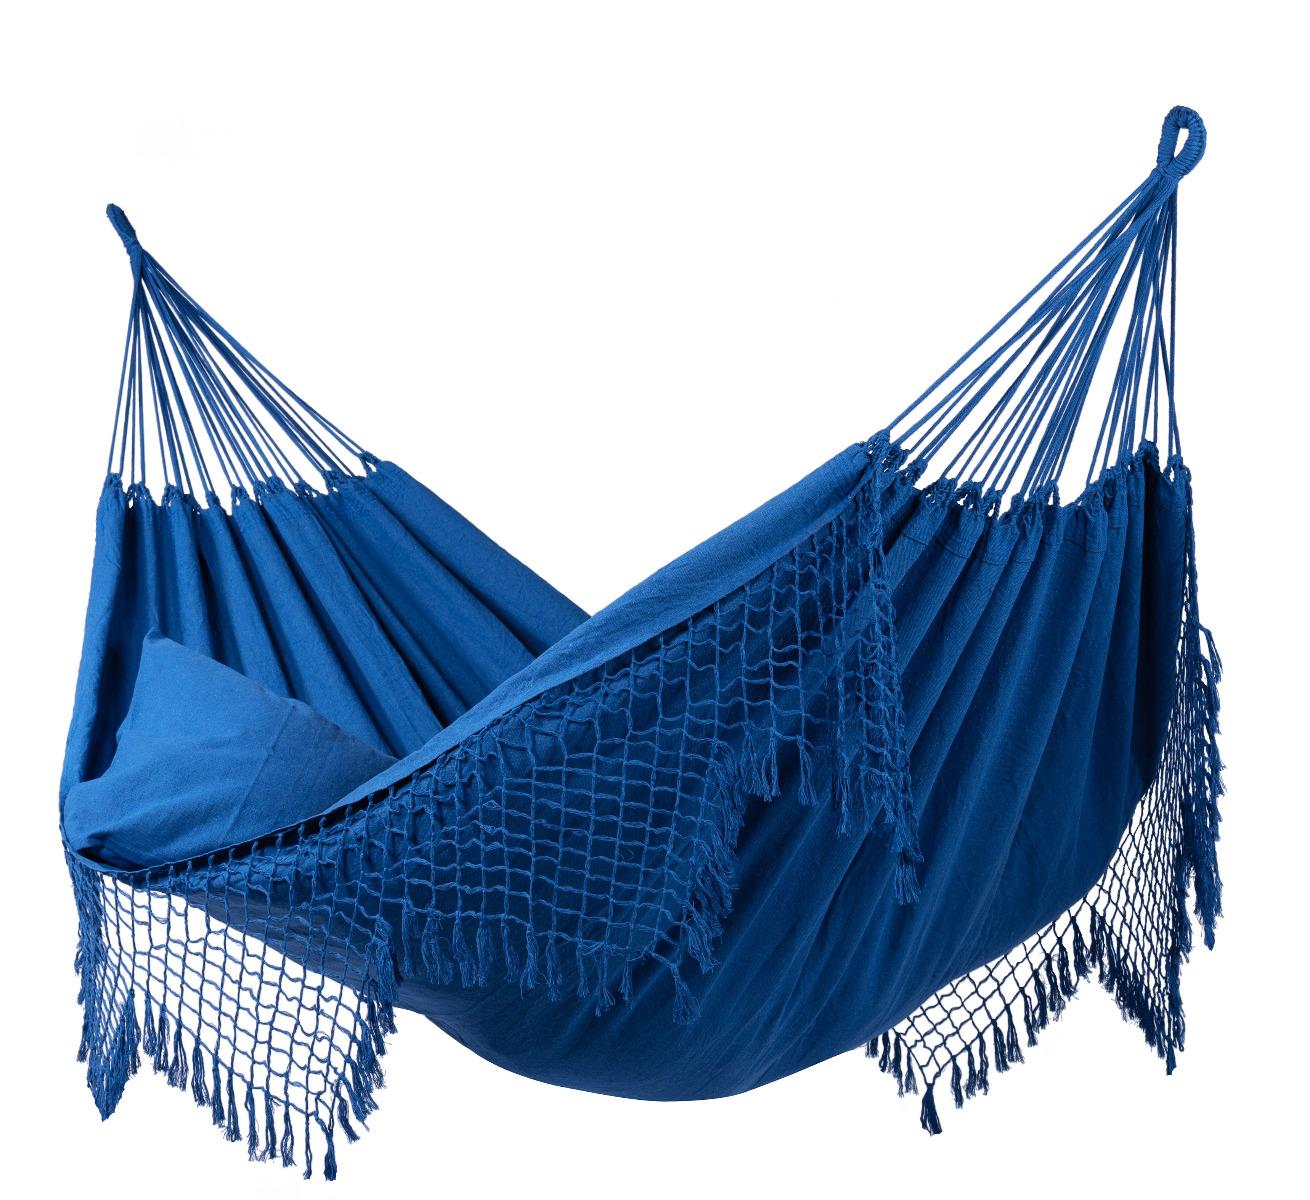 Hangmat 'Fine' Blue - Tropilex �